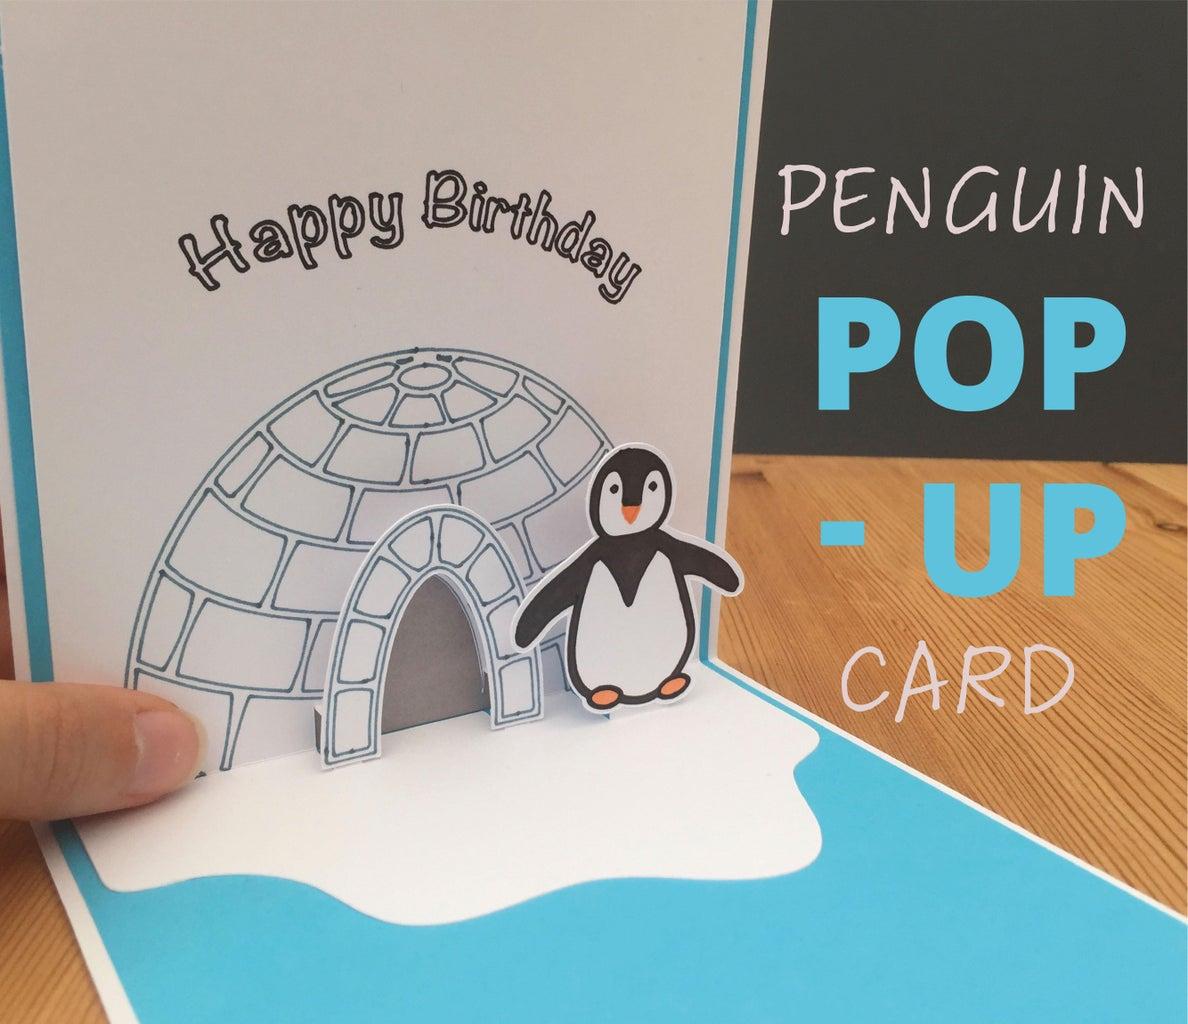 Pop-Up Penguin Card